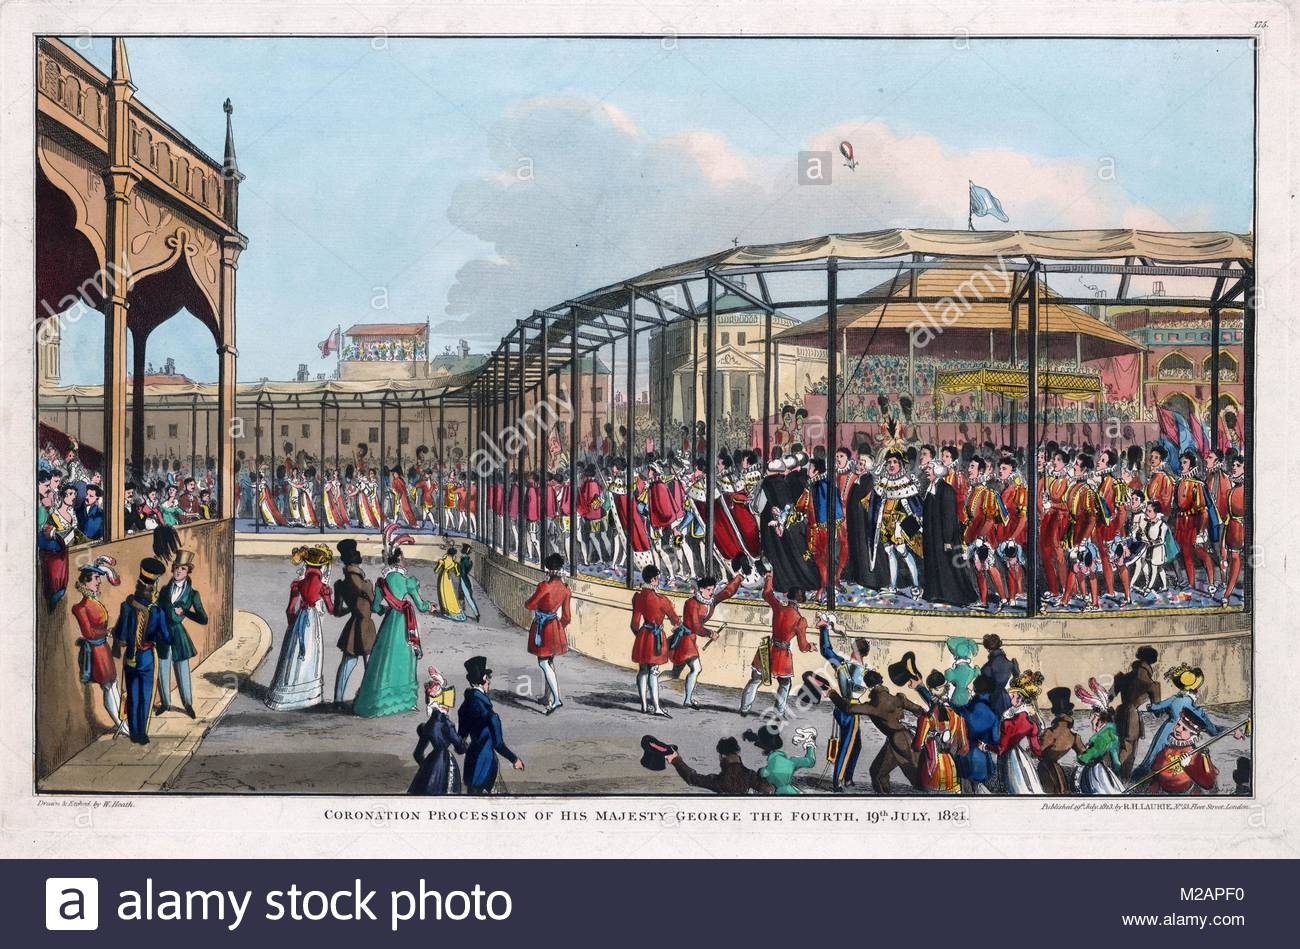 Coronation procession of George IV - Stock Image